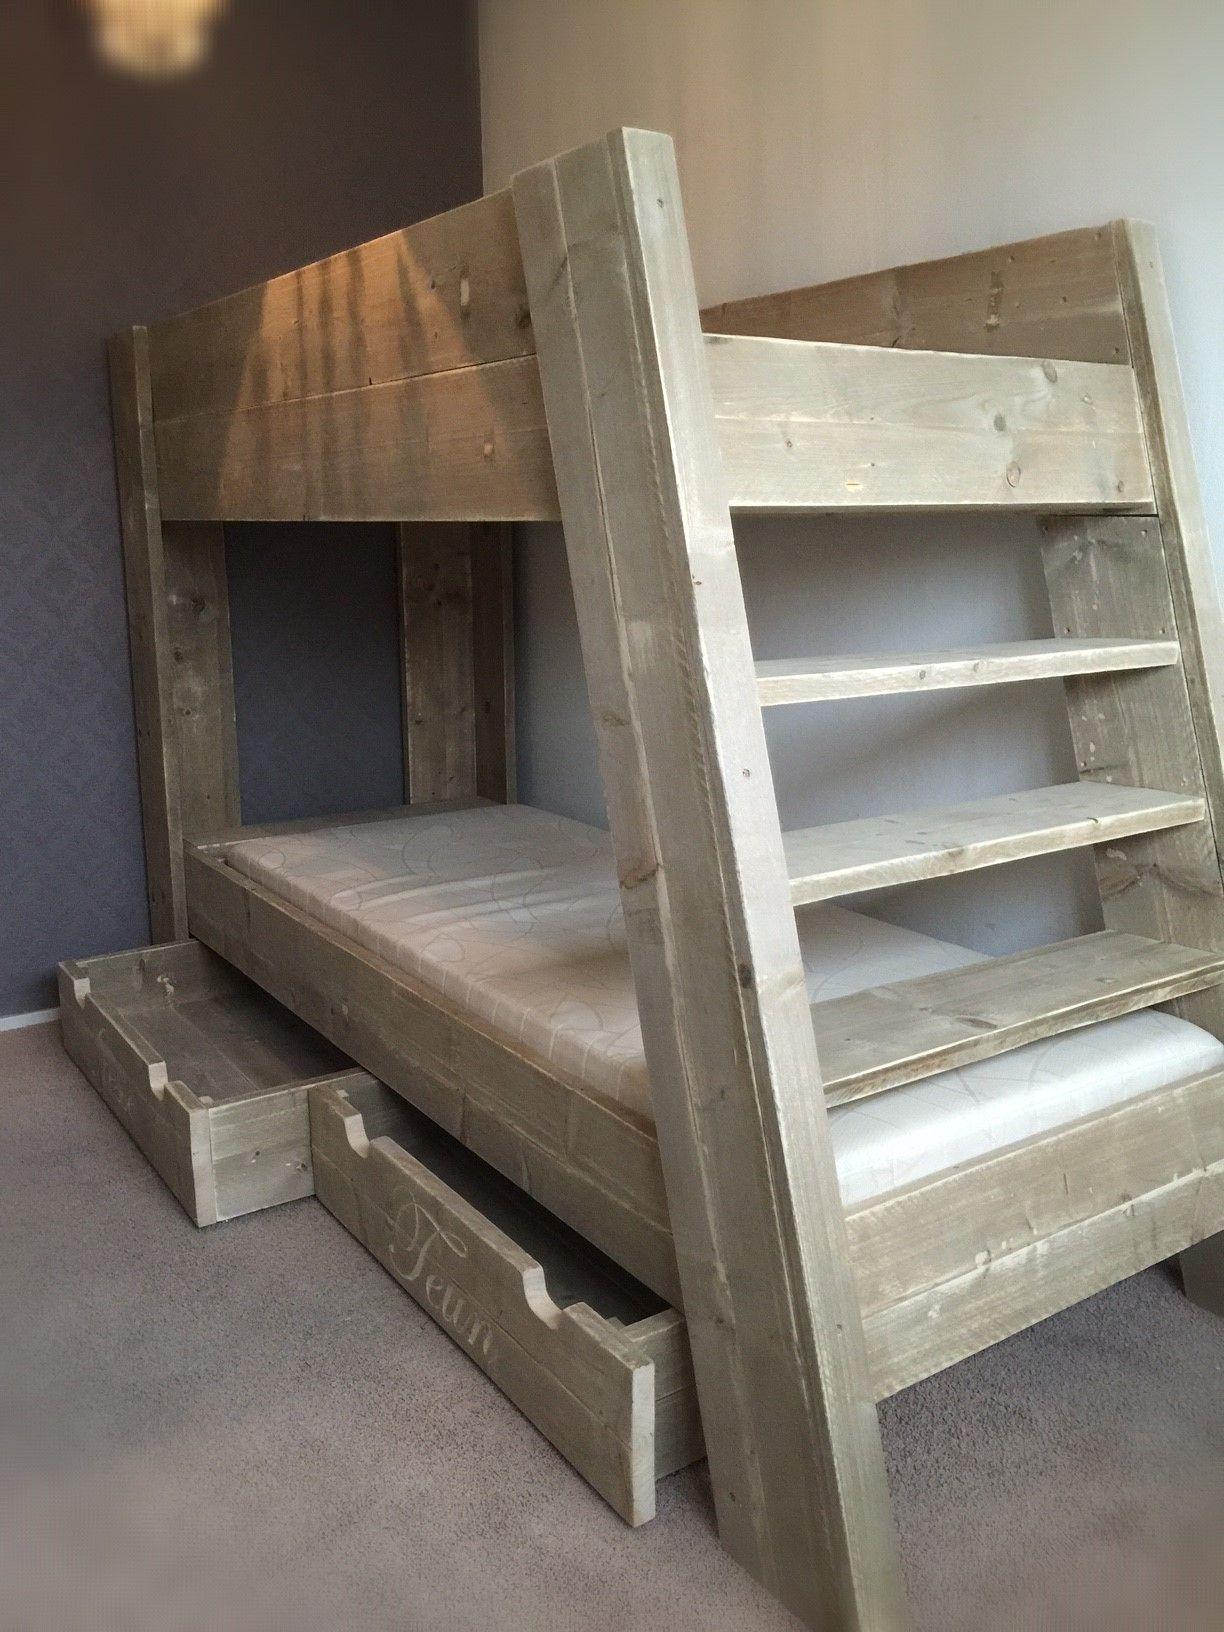 Steigerhouten bedden stapelbed 1 of 2 persoons bed van steigerhout slaapkamer sieds fedde - Mezzanine jongen ...